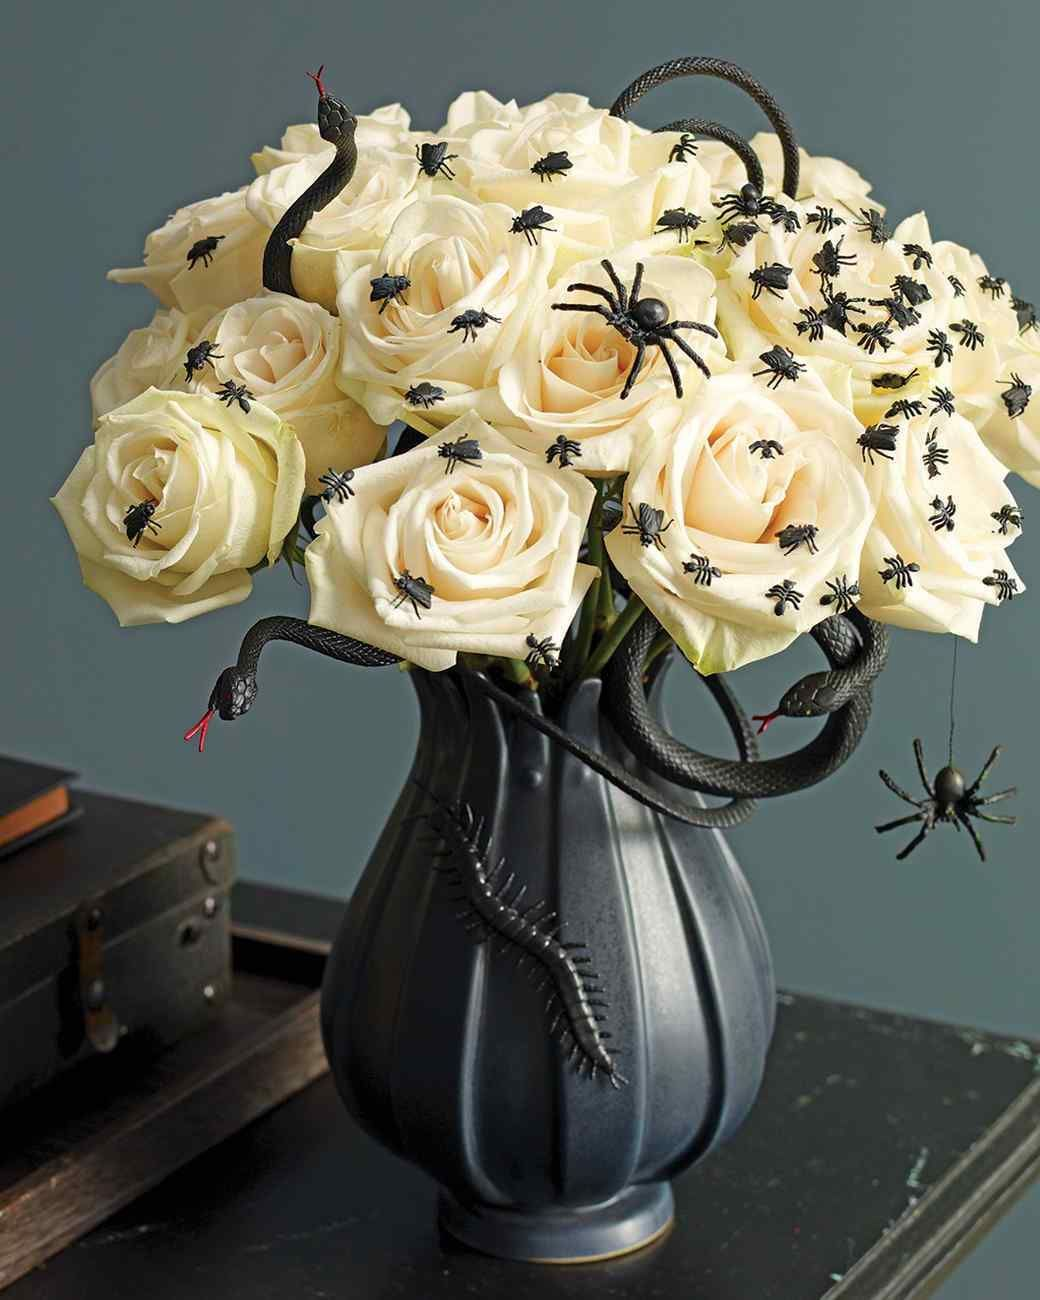 10 Super Easy Dollar Store Halloween DIY Decor Ideas Scary - cool halloween decoration ideas